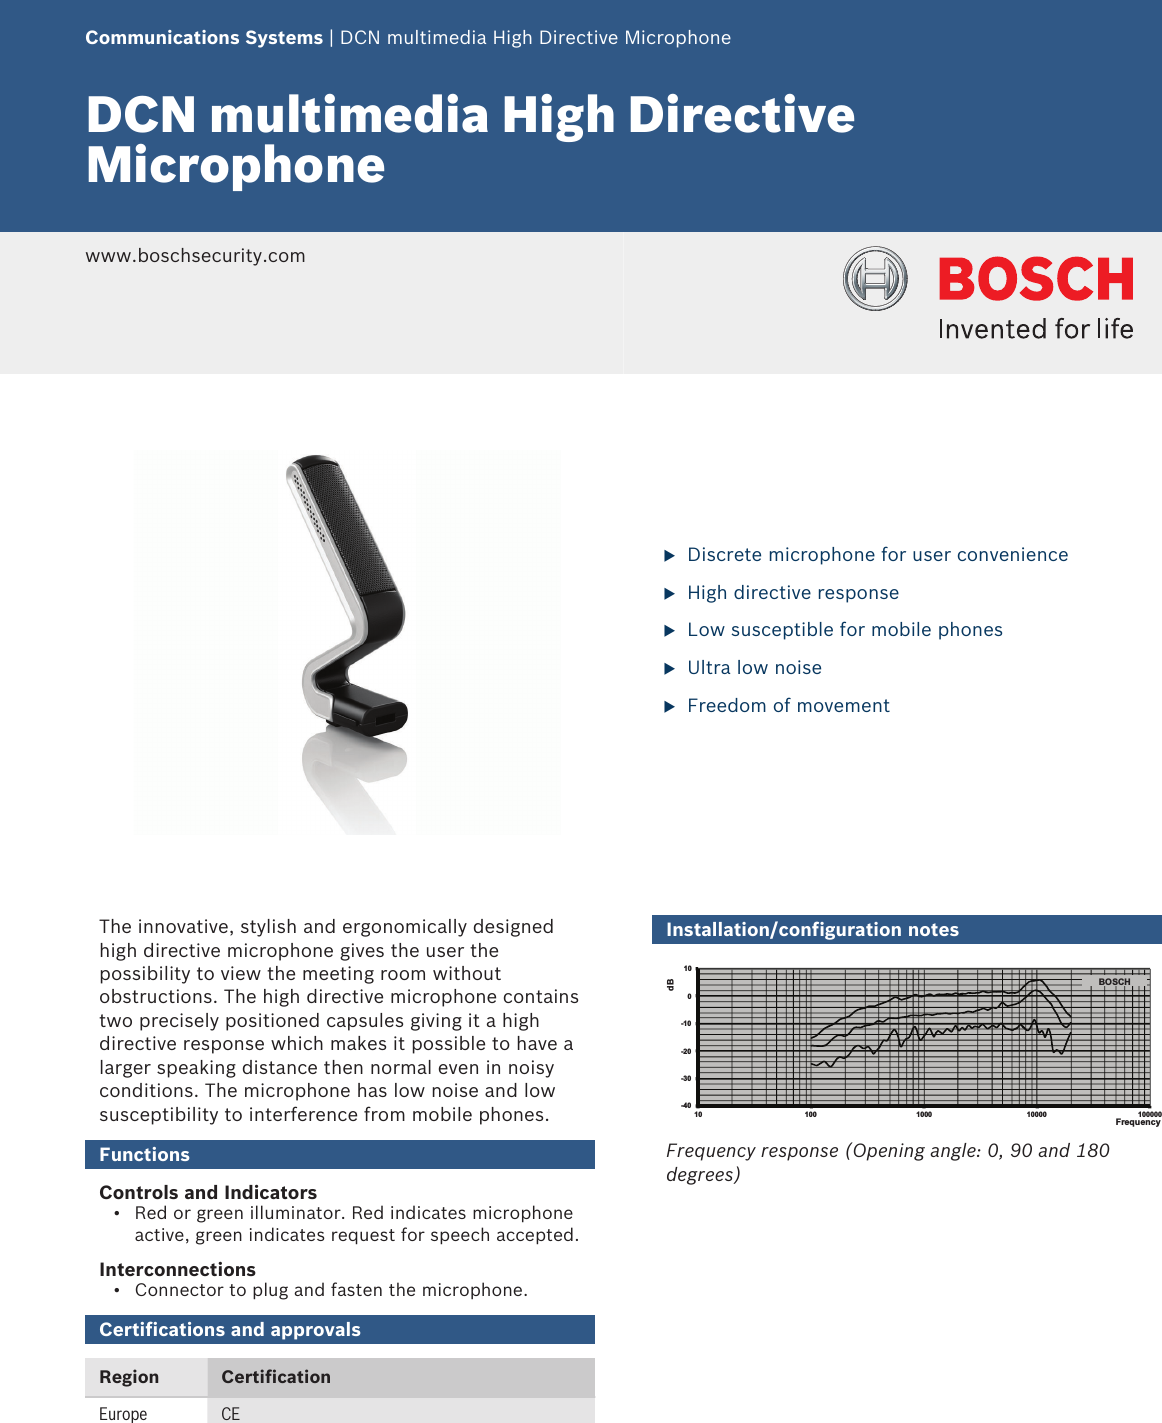 Boschdcnmhdmic DCN Multimedia High Directive Microphone User